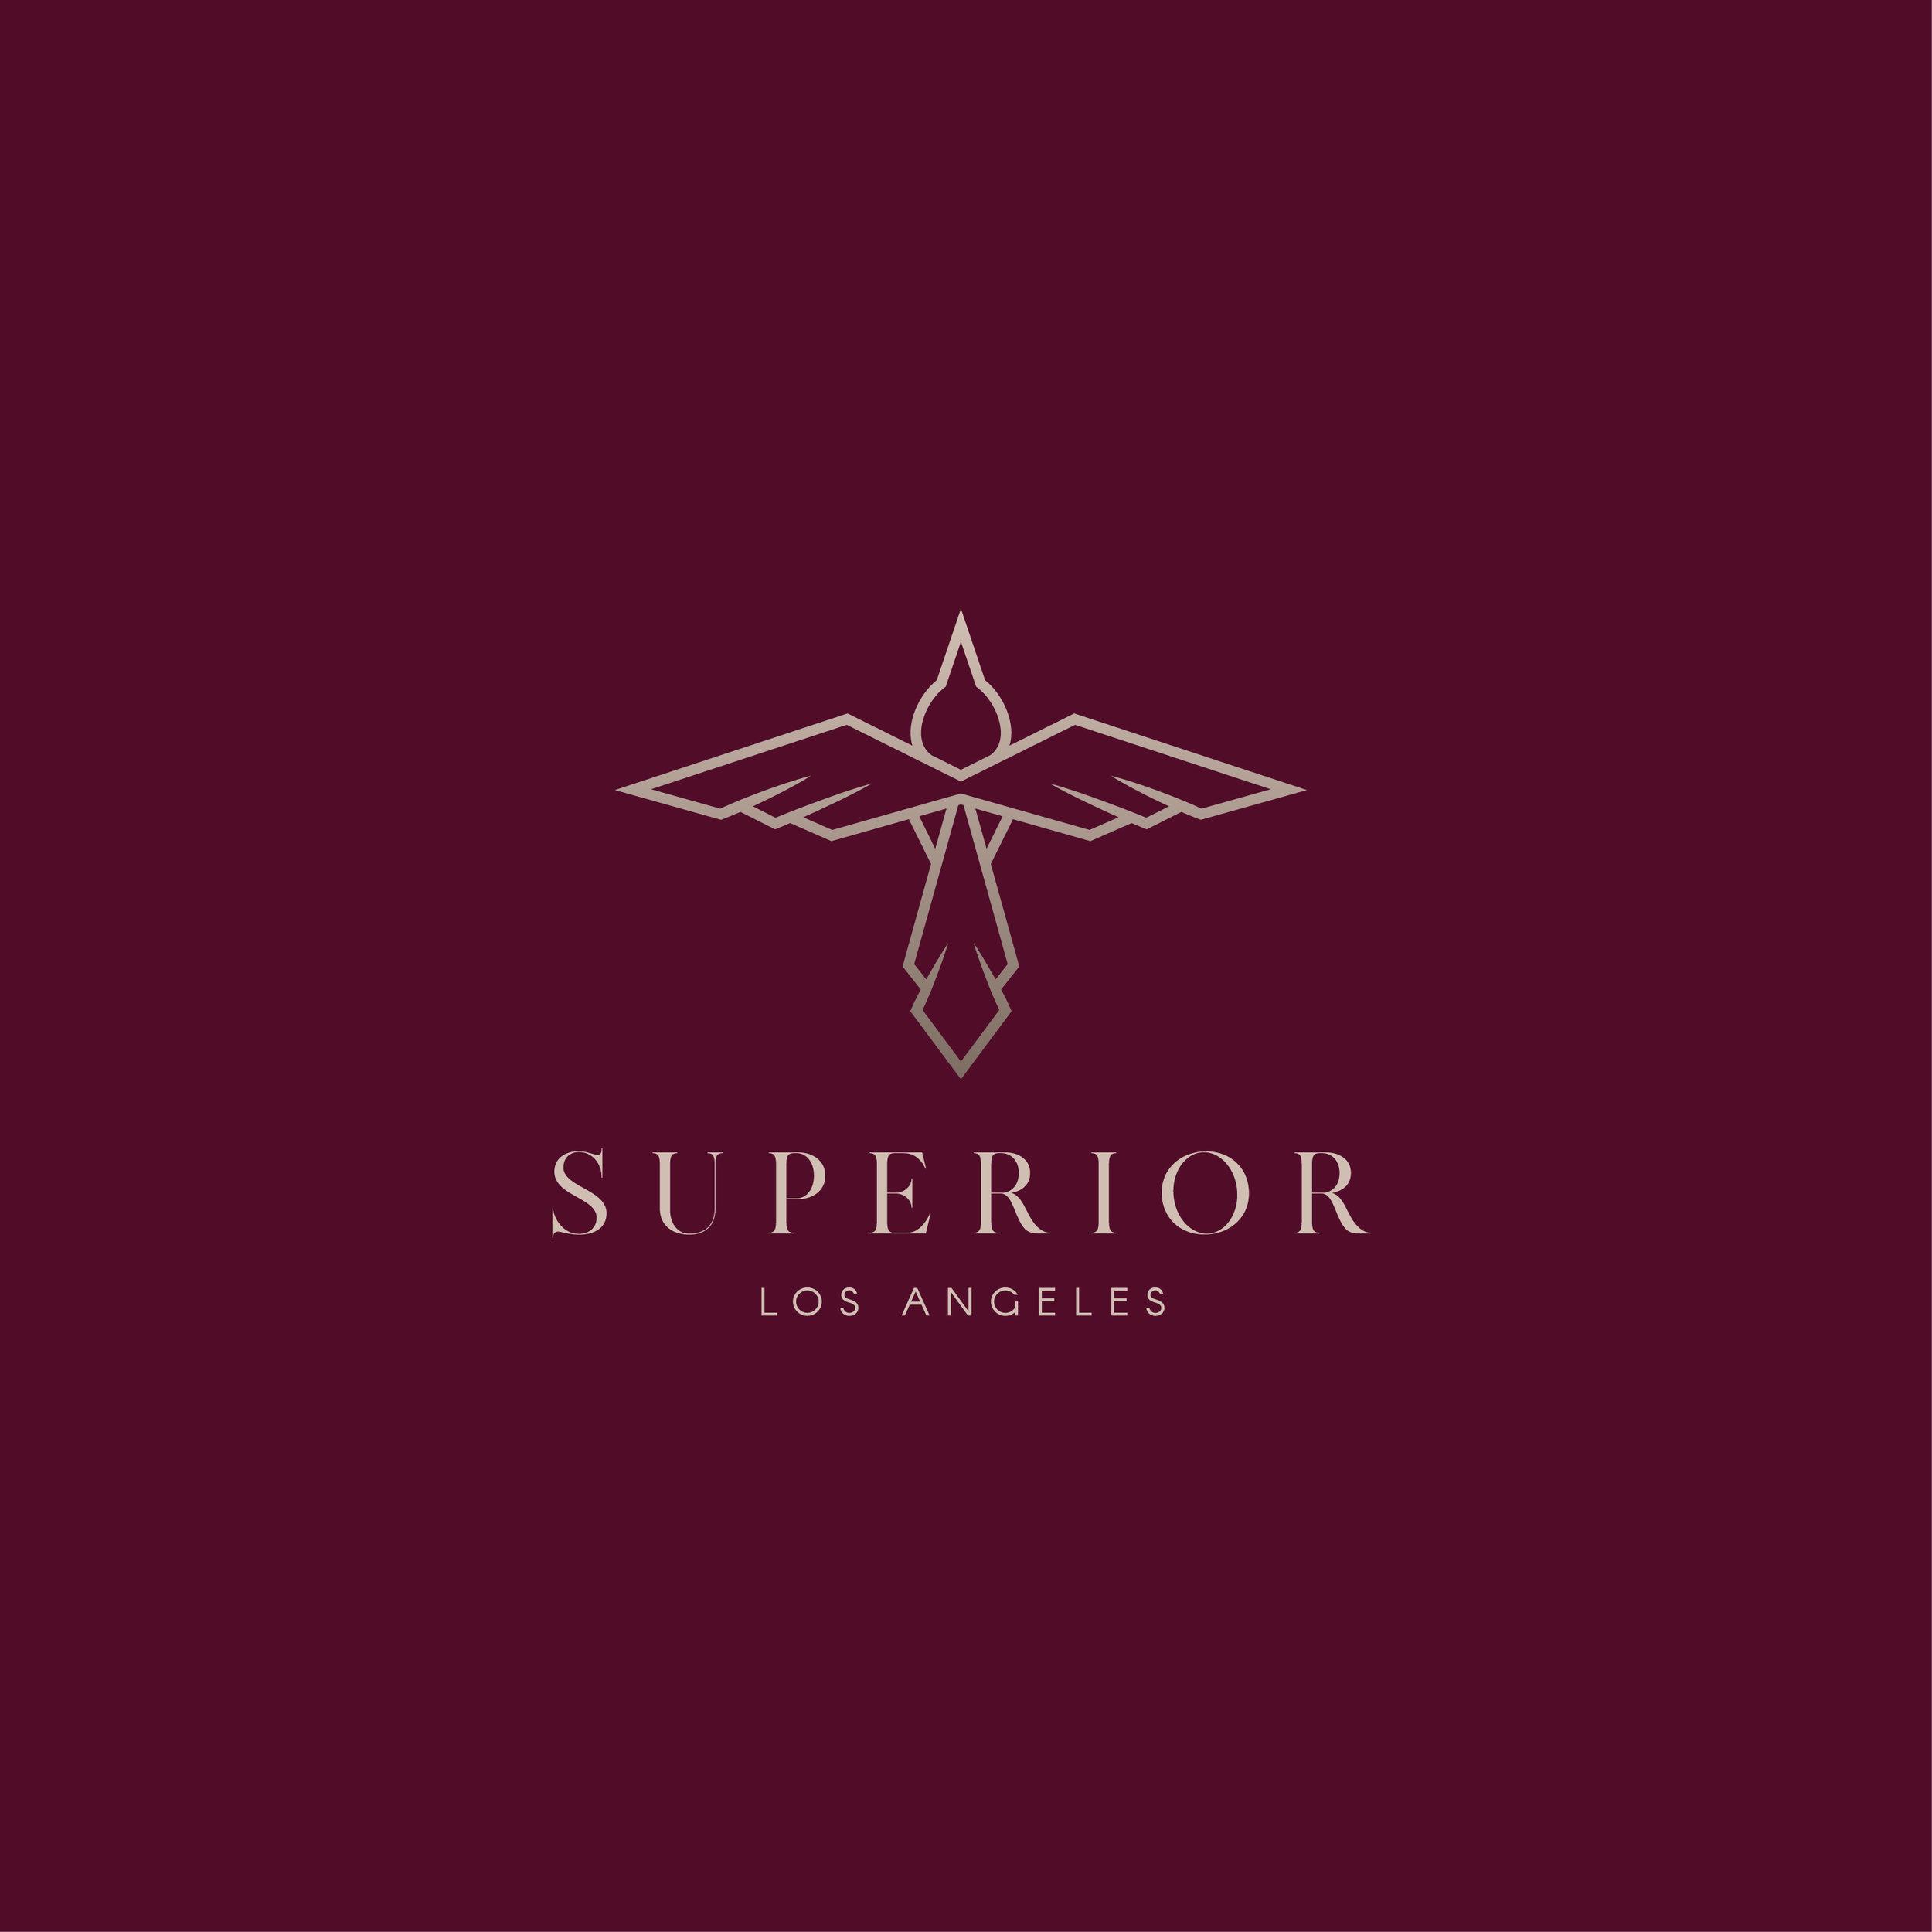 SUPERIOR-1.jpg